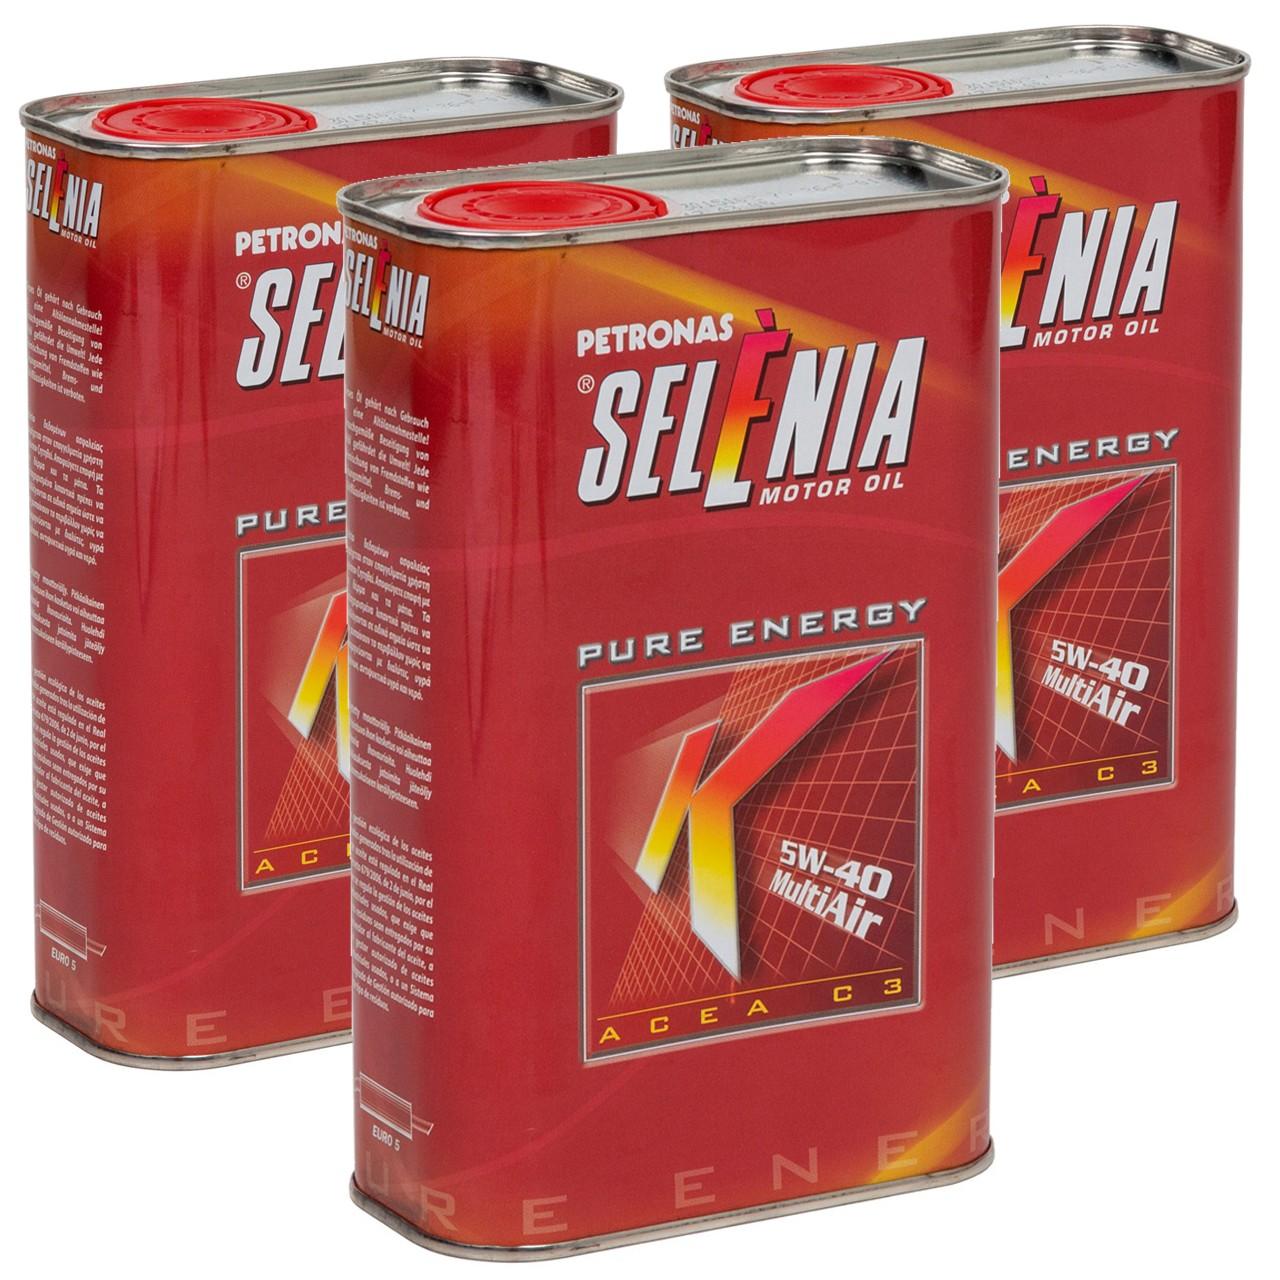 PETRONAS SELENIA Motoröl Öl K PURE ENERGY 5W40 5W-40 Fiat 9.55535-S2 - 3 Liter